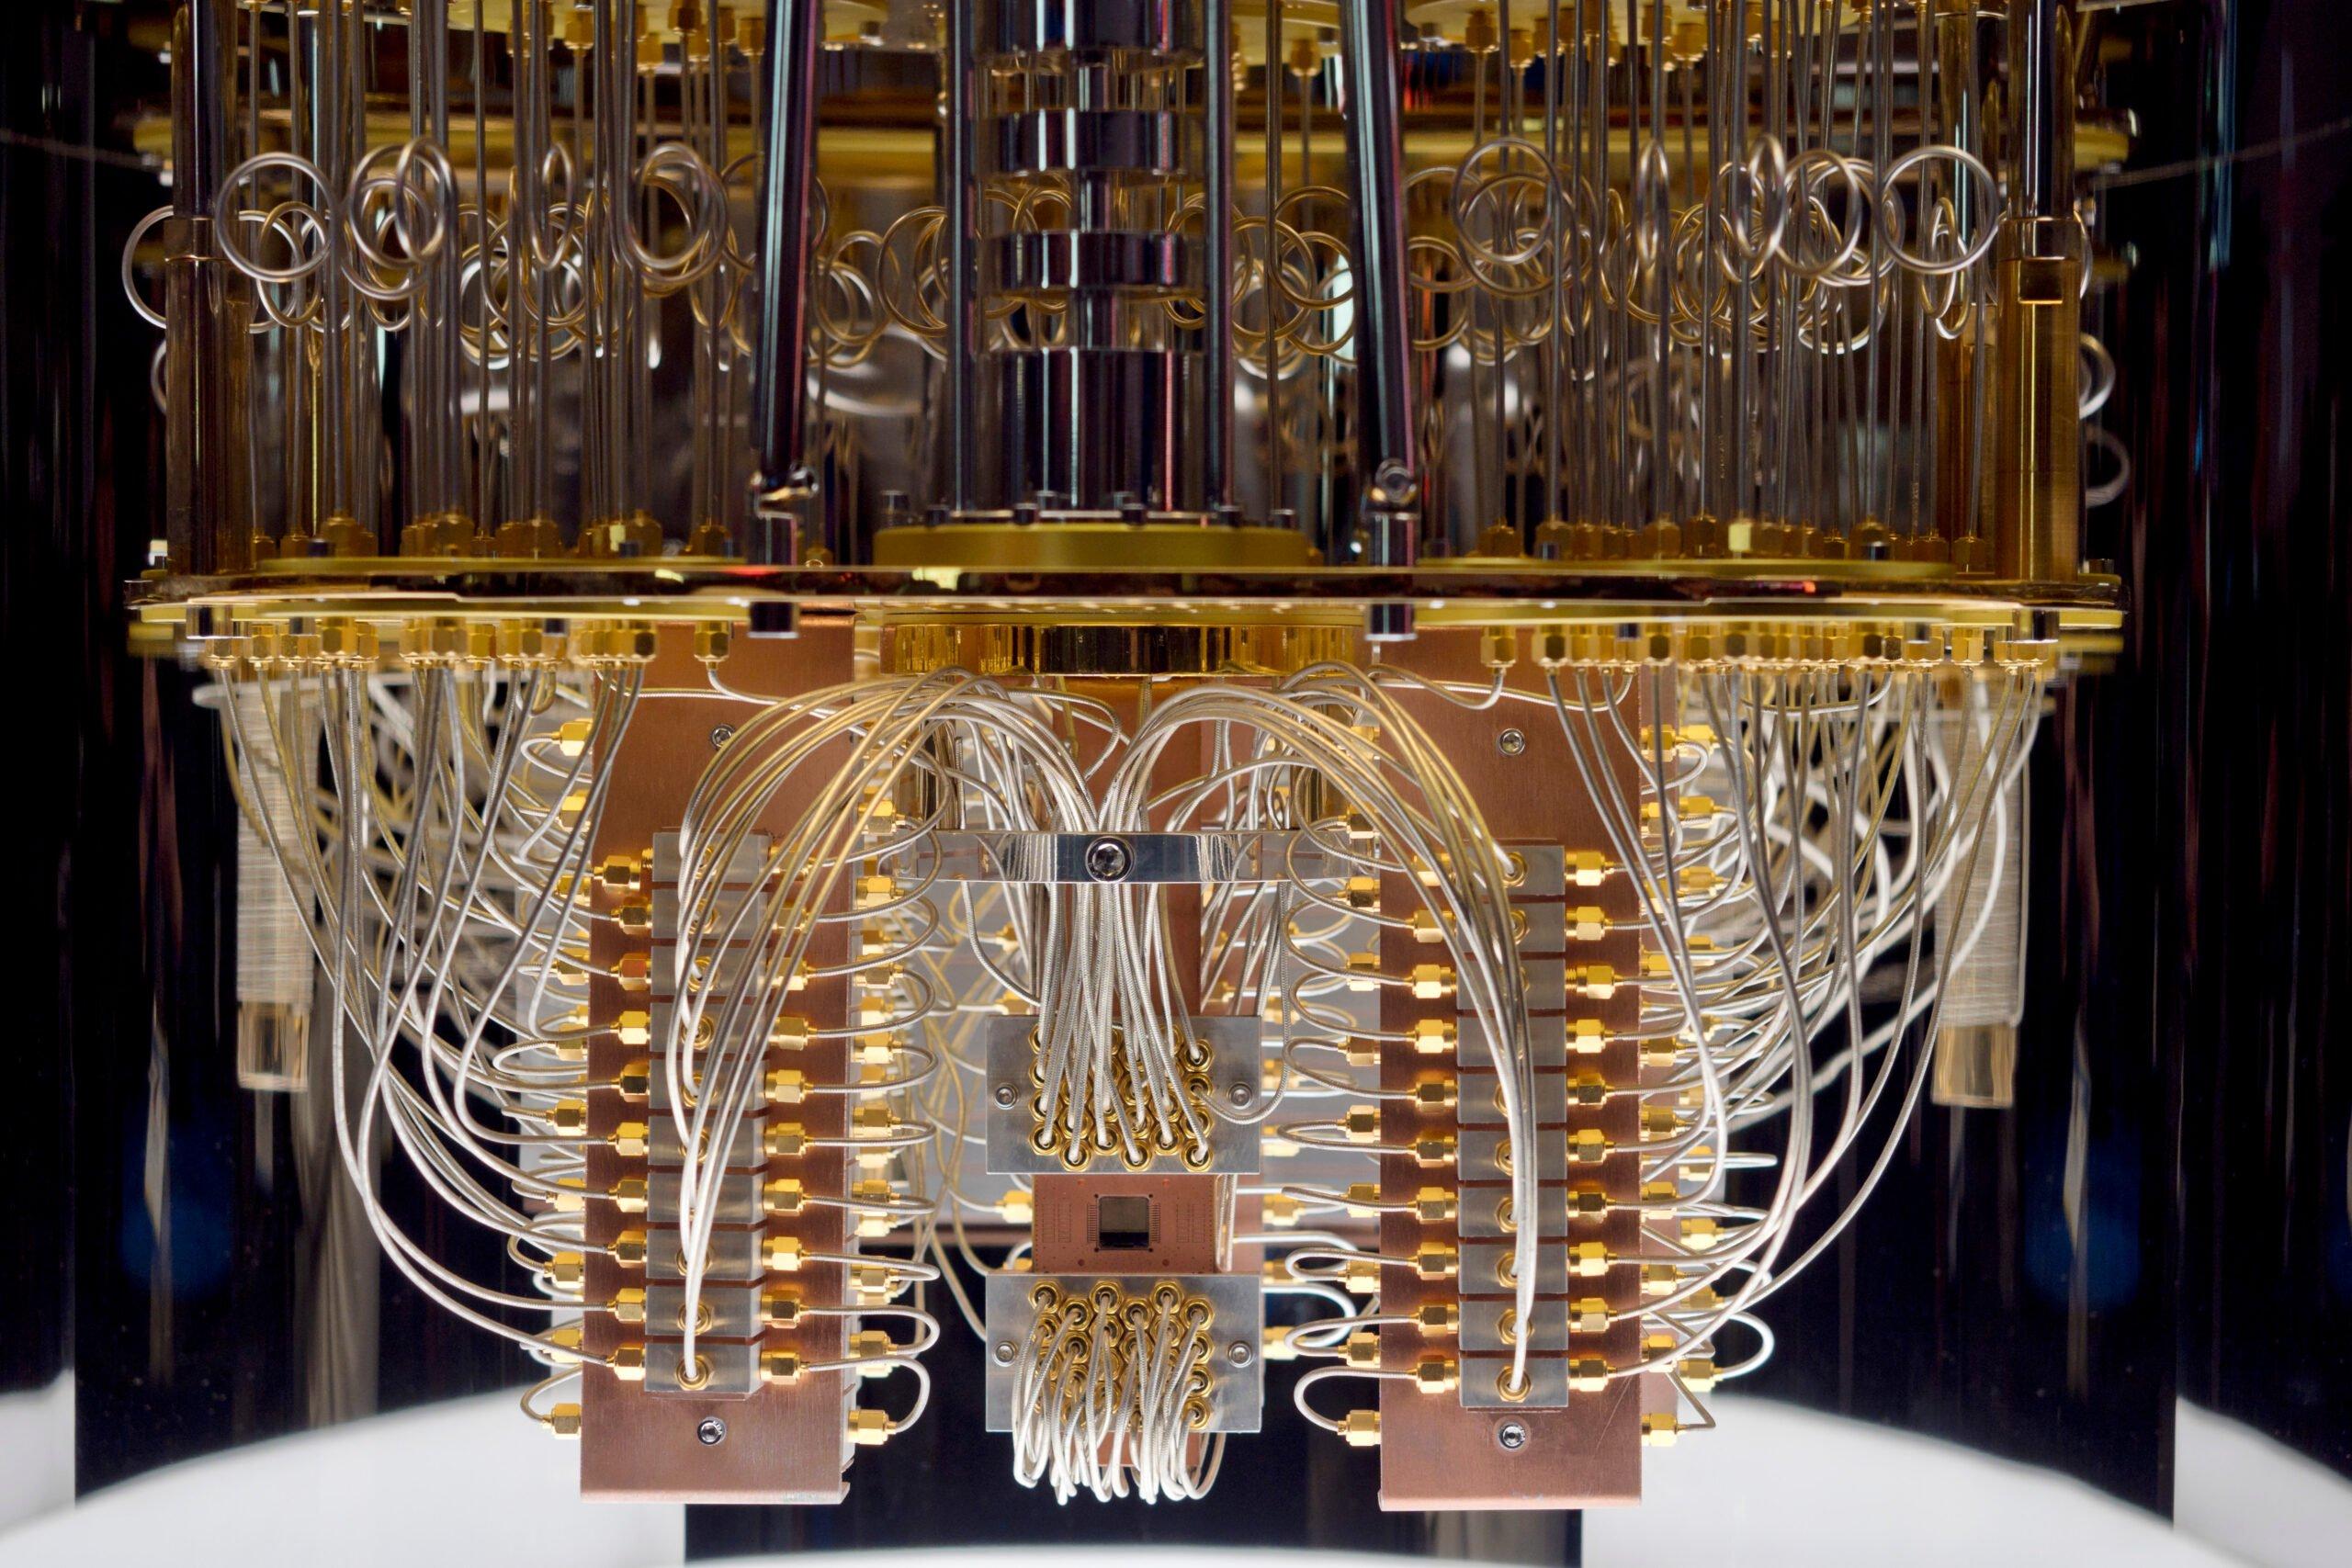 NEC Australia, D-Wave partner with Defence on quantum computing - APDR